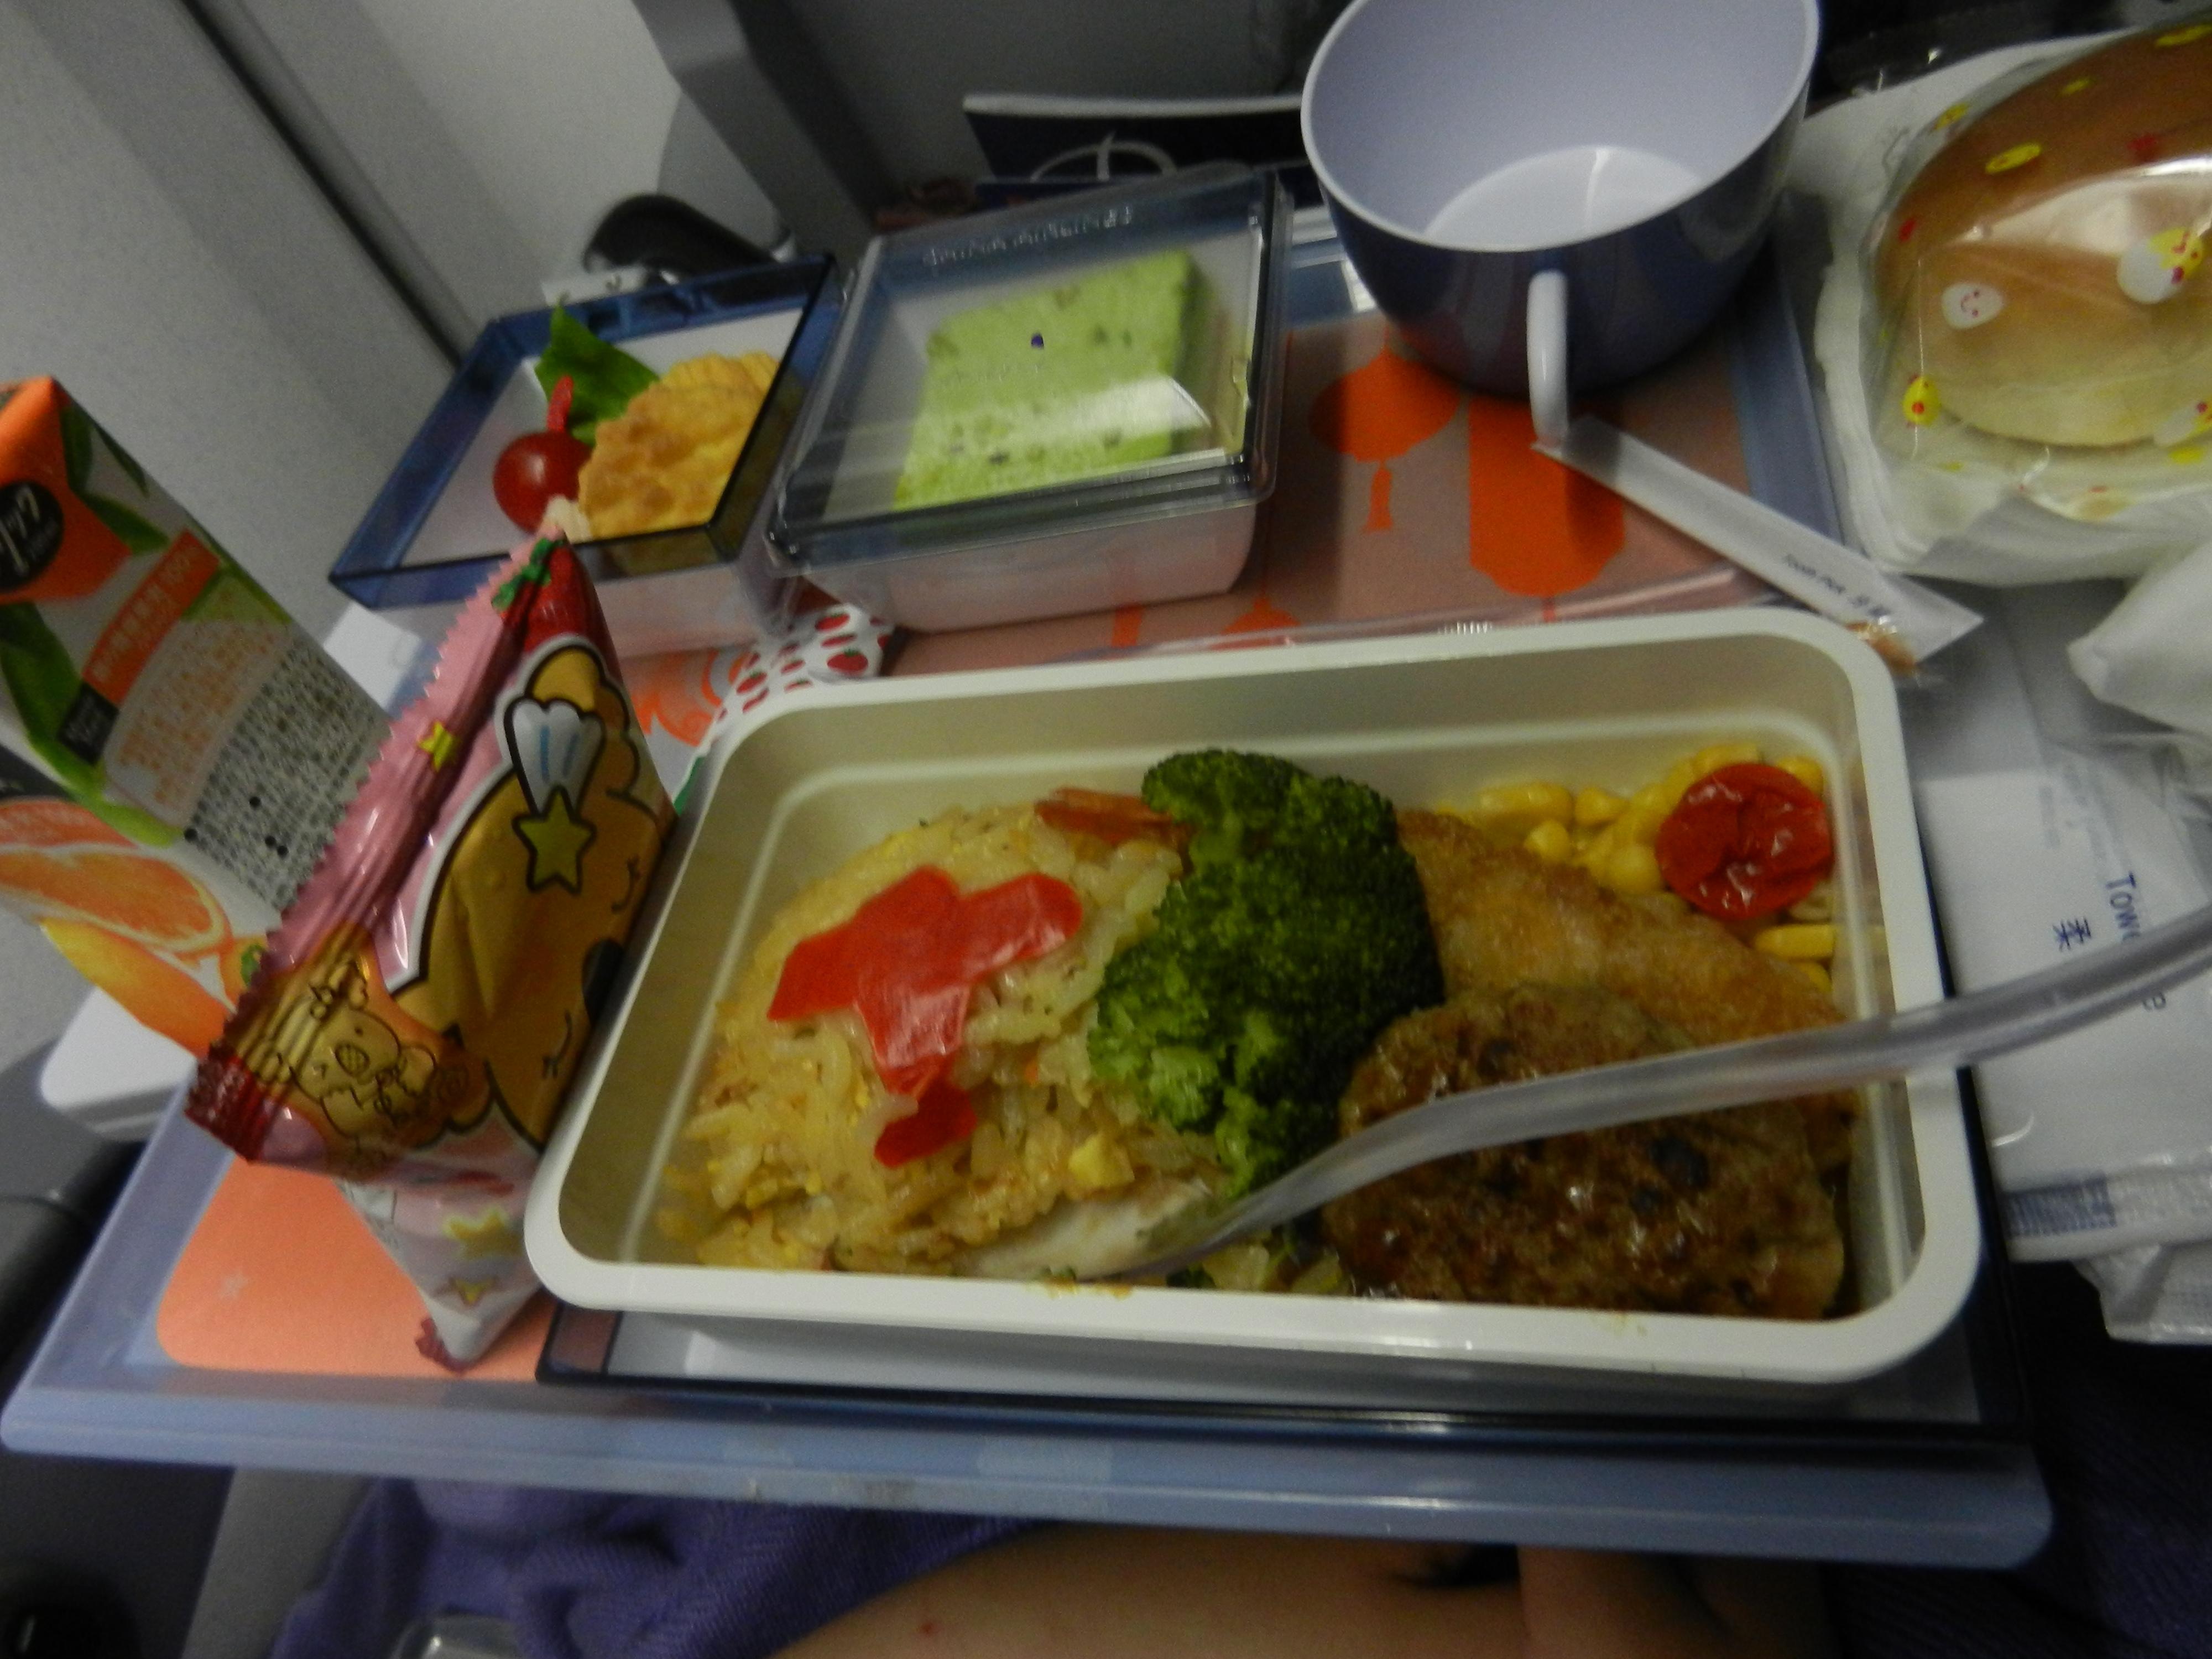 China_Airlines_Economy_Class_Meal_(Tokyo_(Narita)_~_Honolulu)